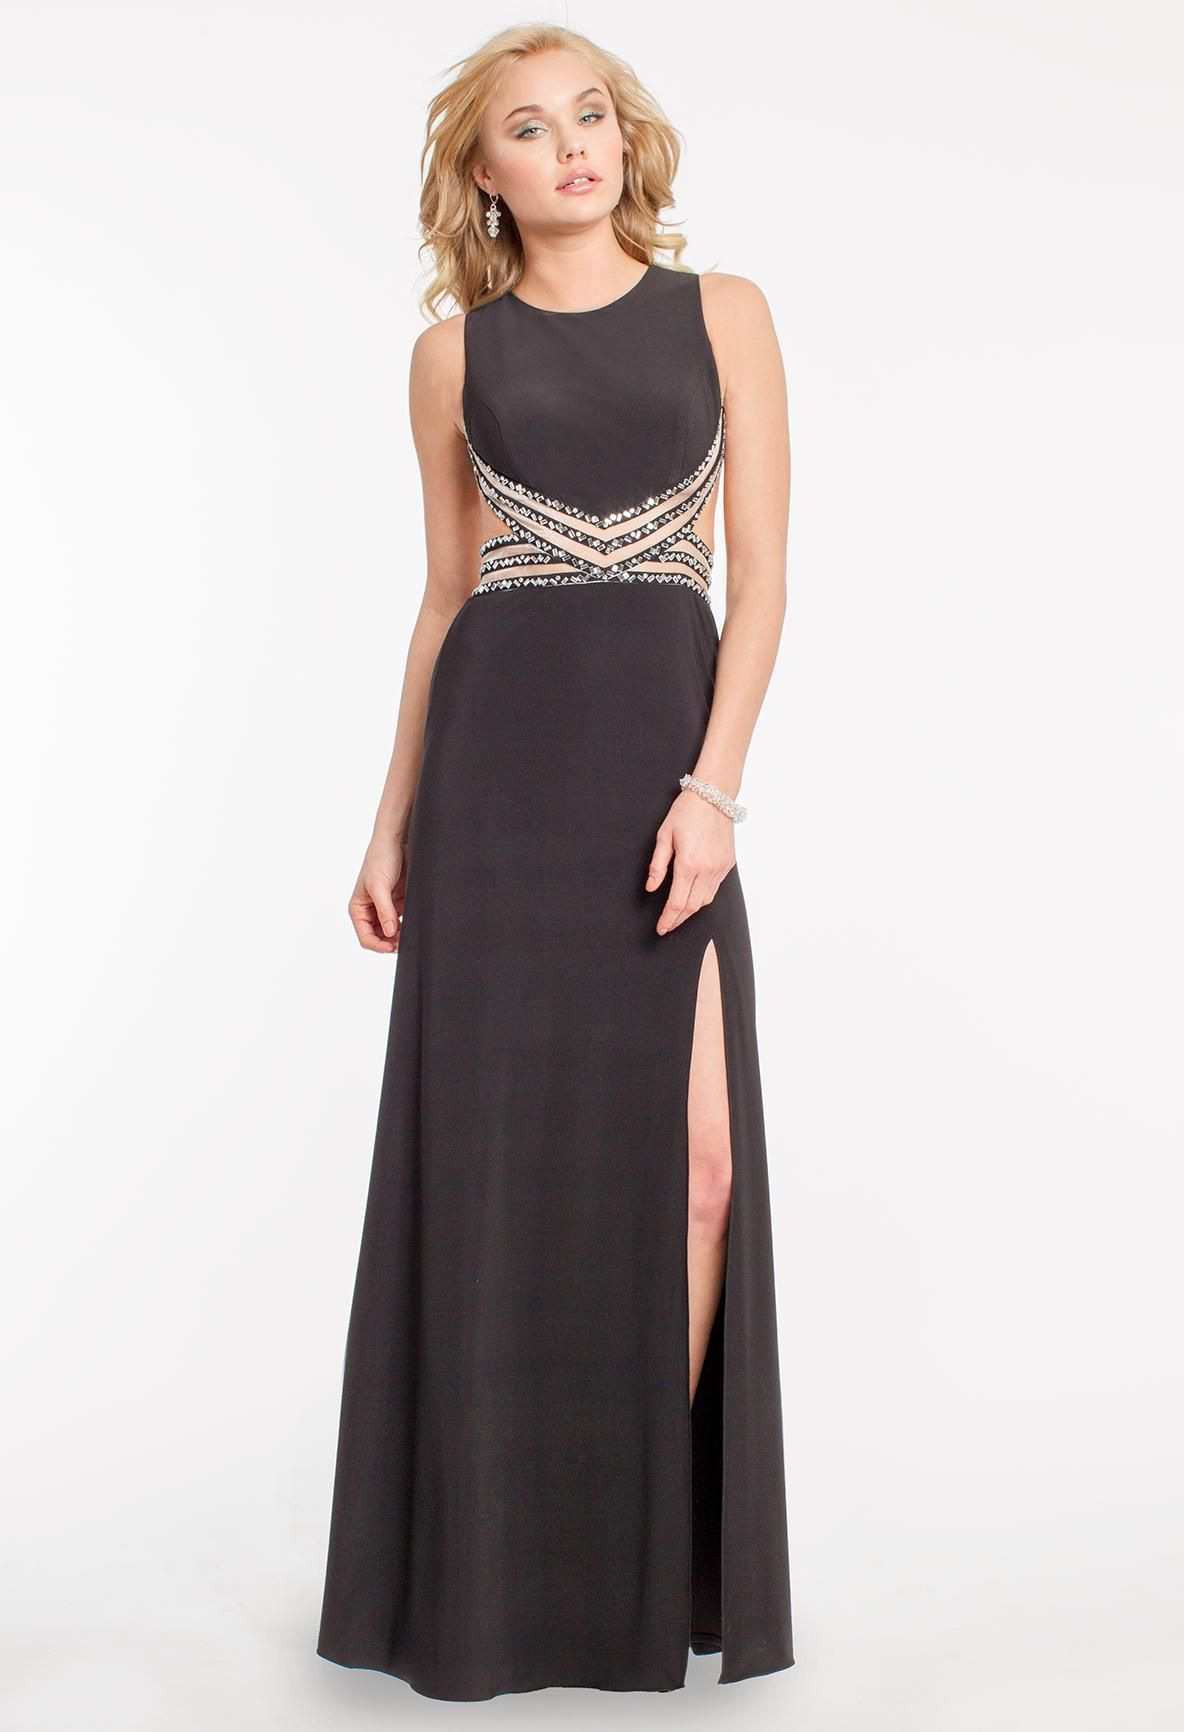 Beaded side cutout prom dress camillelavie clvprom prom dresses